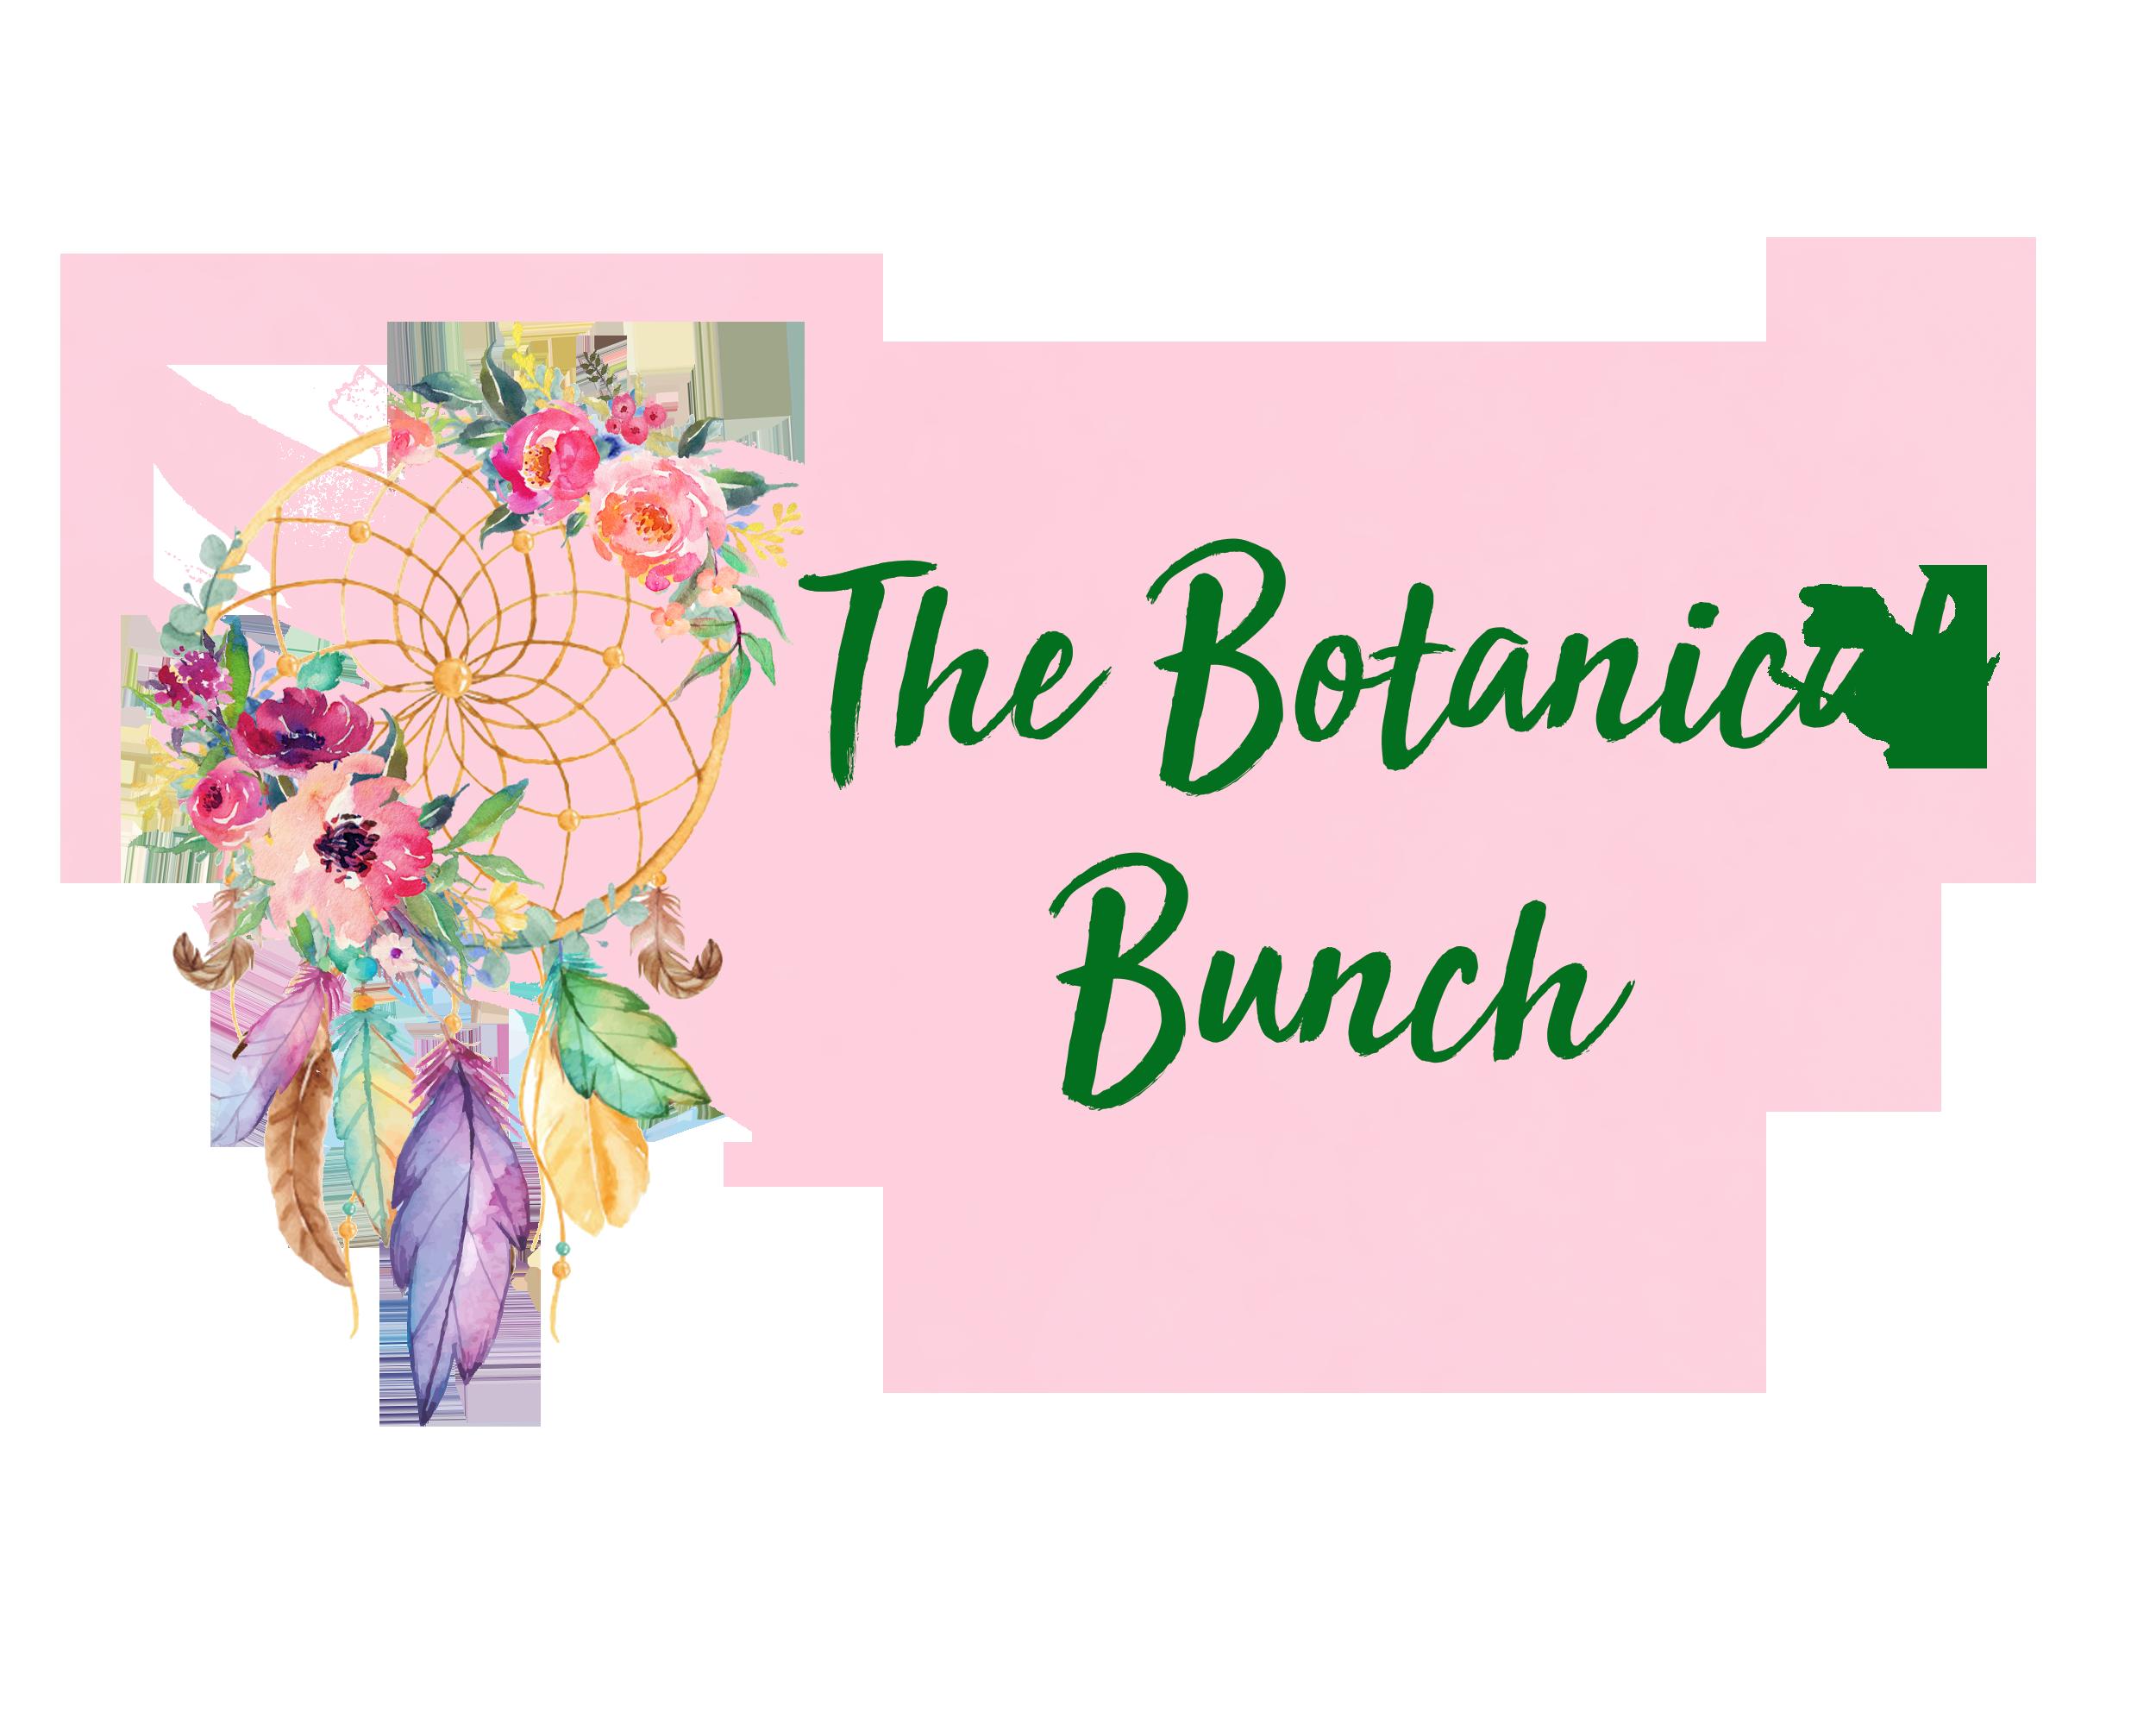 The Botanical Bunch